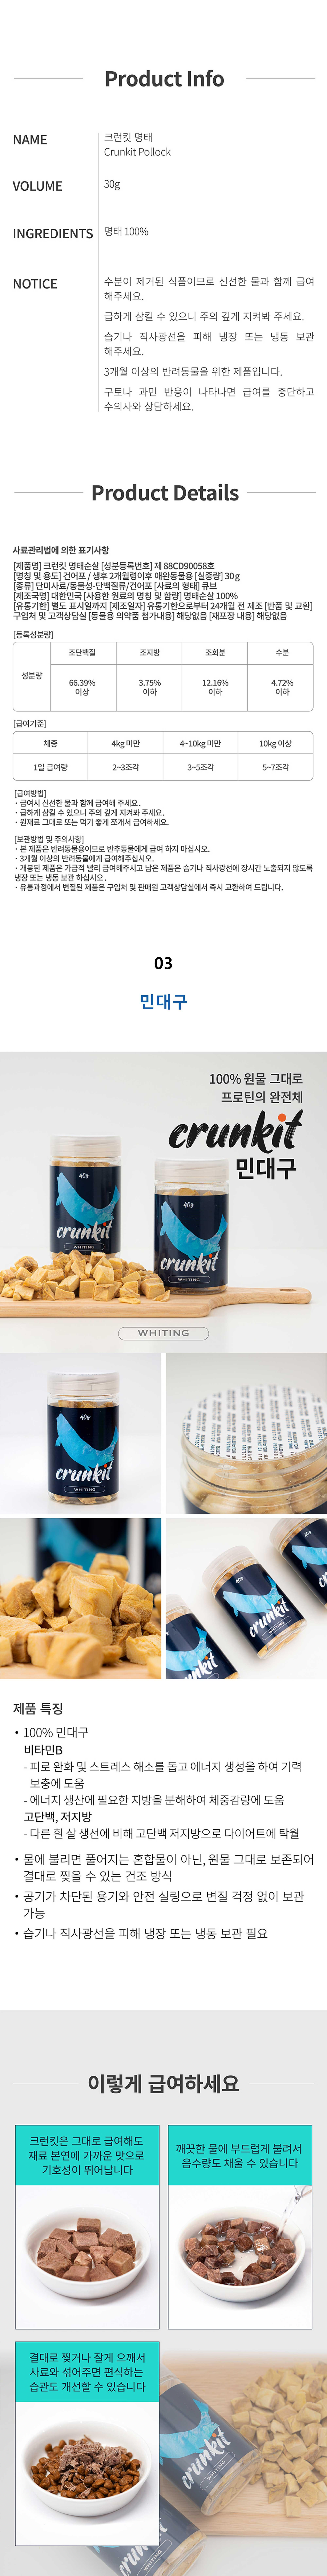 [FITPET 반려동물] SEAFOOD 간식 3종 세트 - 가자미/명태/민대구